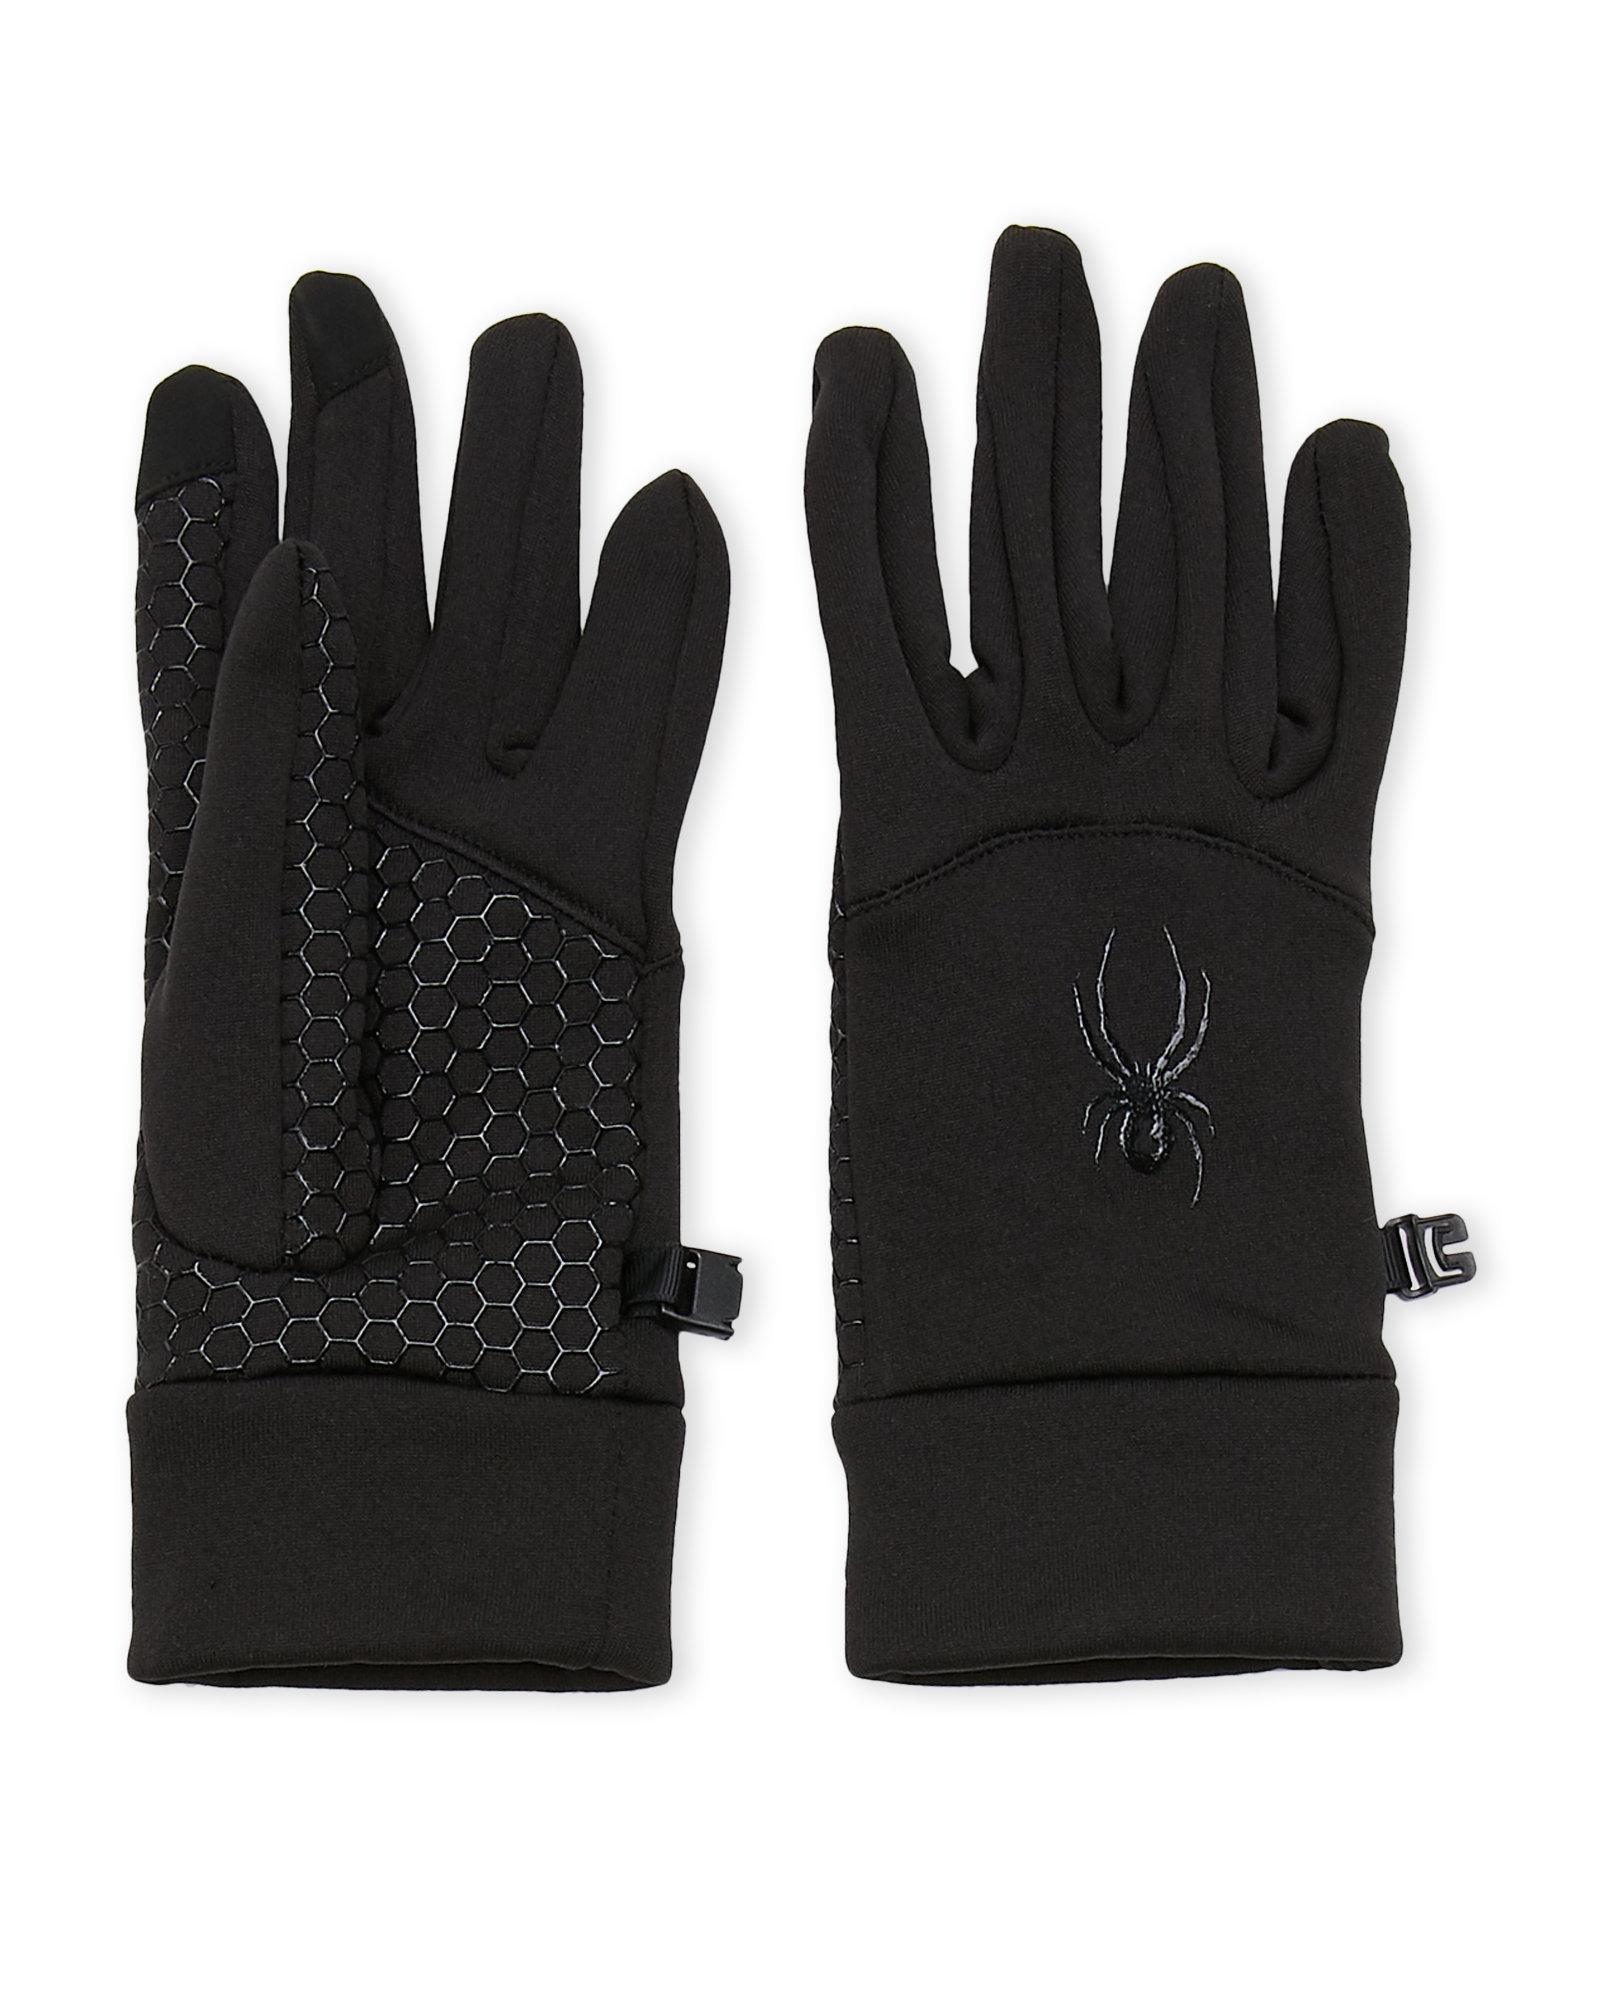 Lyst - Spyder Touchscreen Stretch Fleece Gloves in Black 85323a7a92